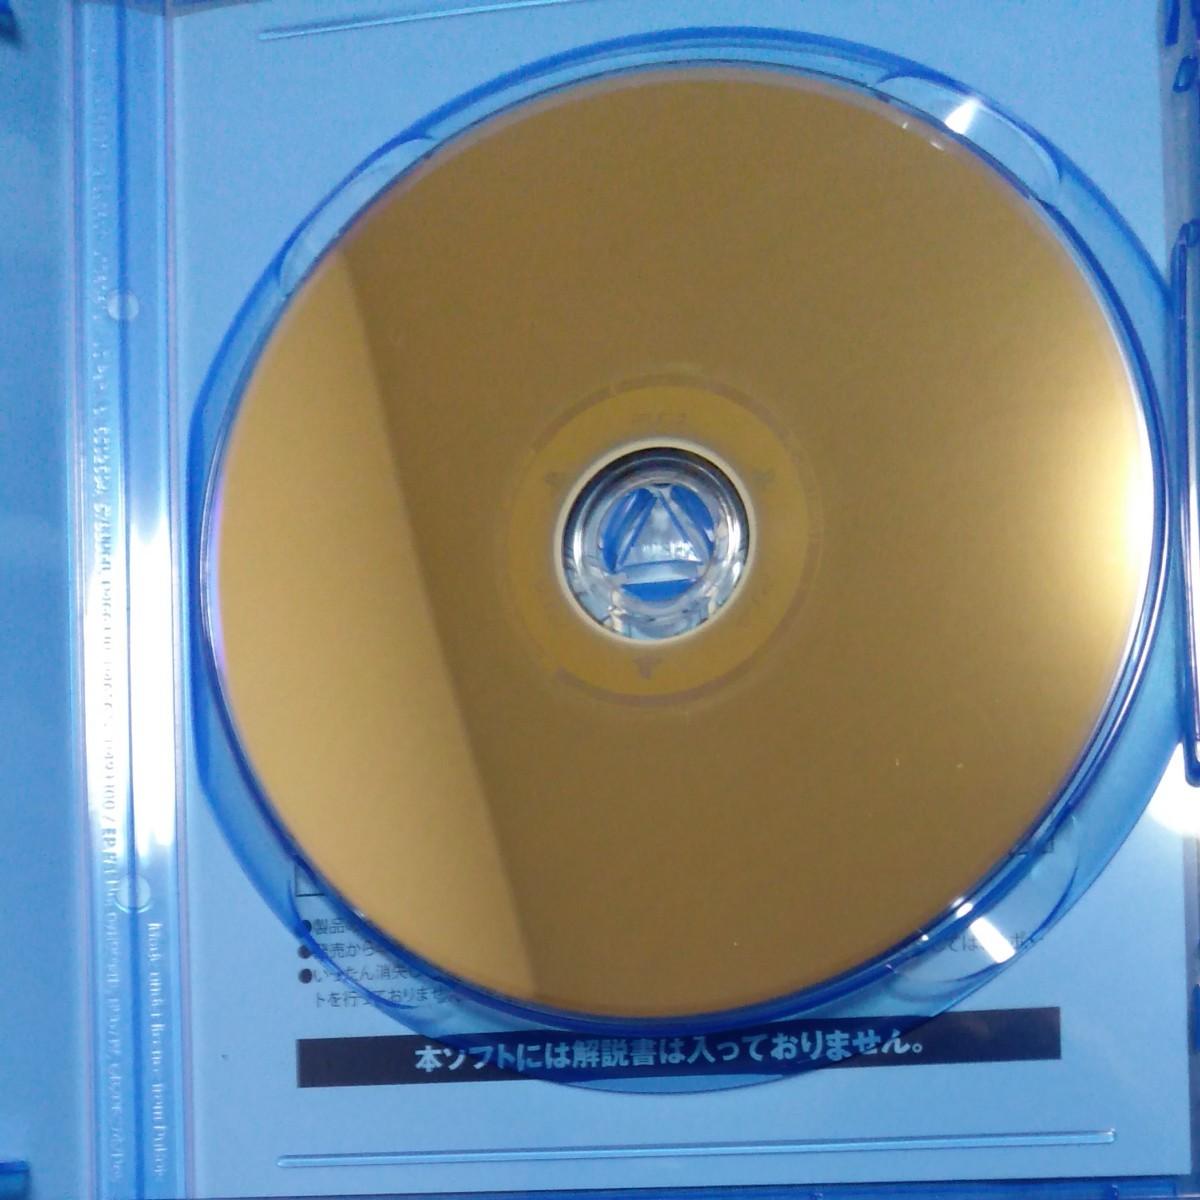 FINAL FANTASY crystalchronicleリマスター PS4